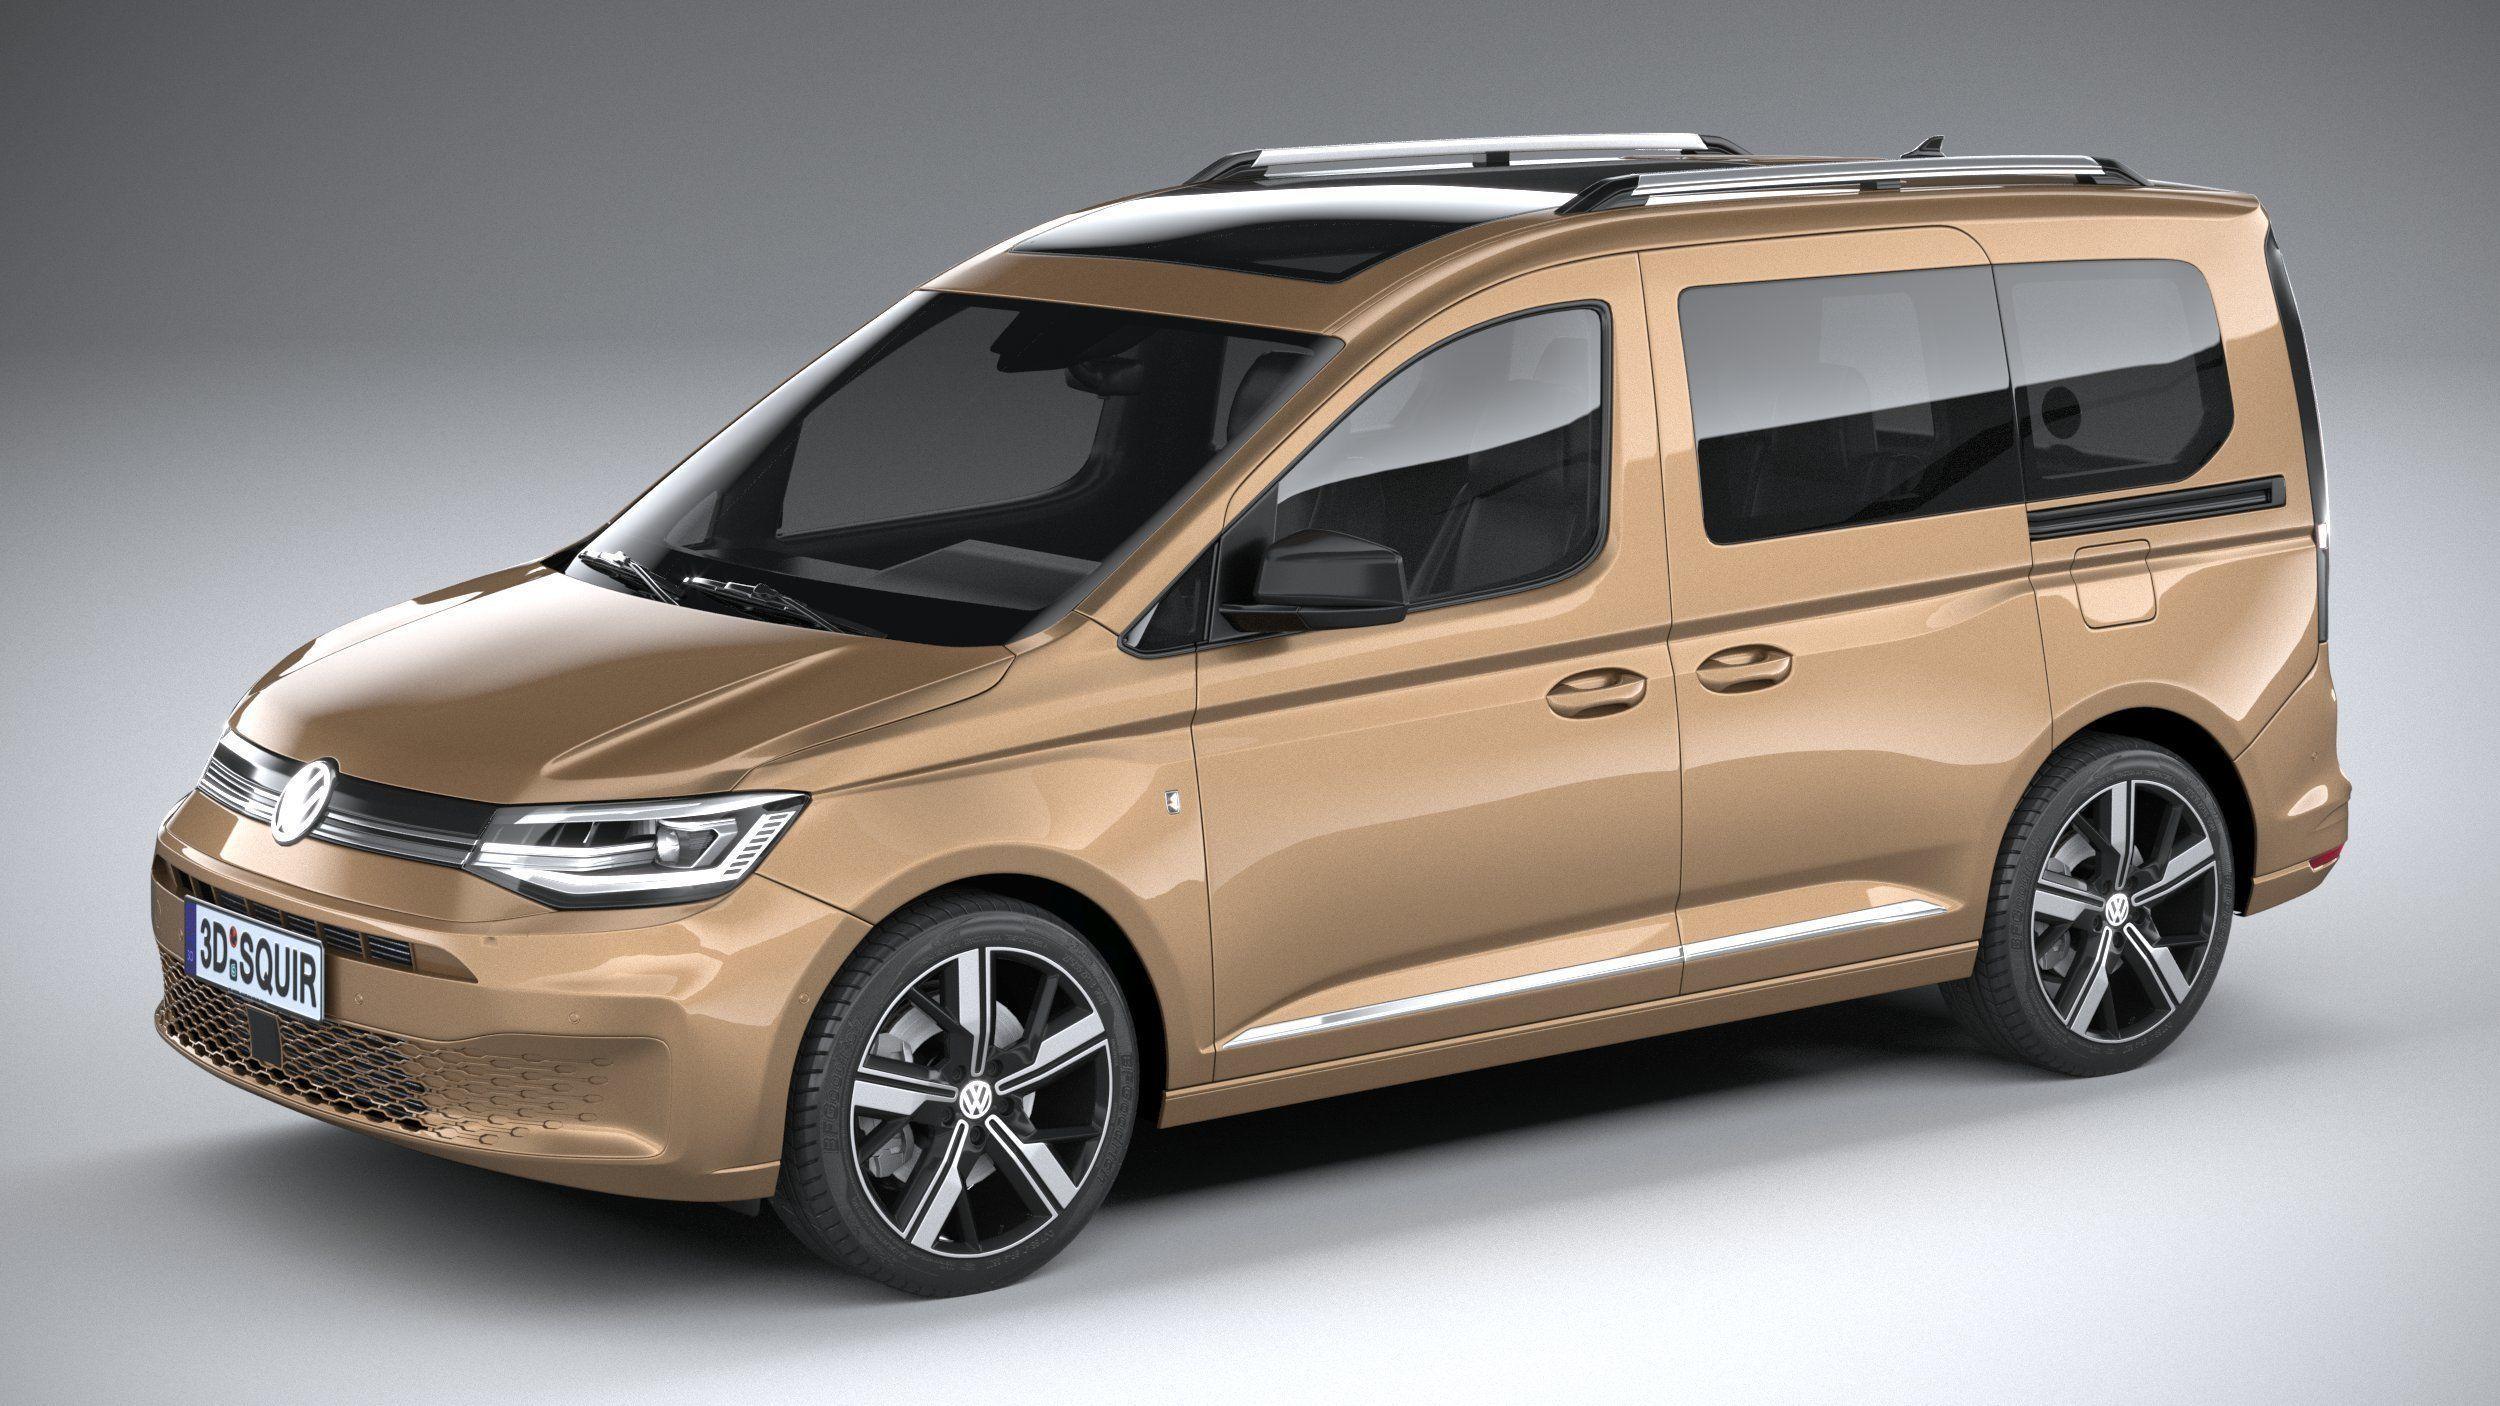 Volkswagen Caddy 2021 3D model MAX OBJ 3DS FBX C4D LWO